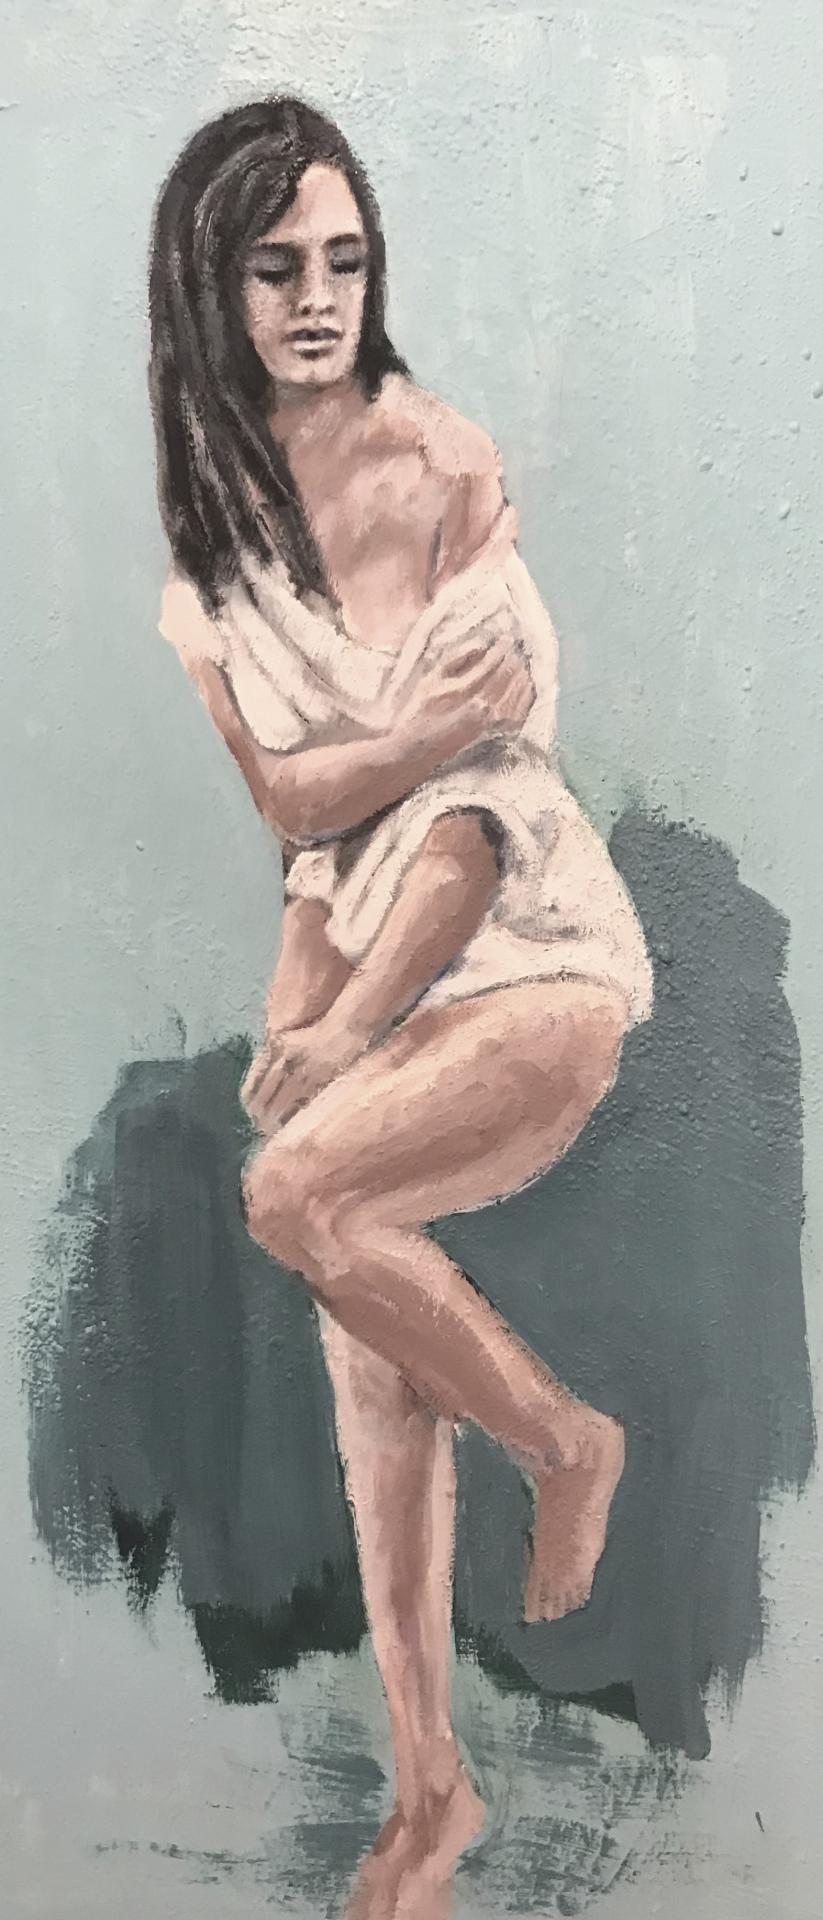 'shyness', Öl auf Leinwand, 80 cm h x 30 cm b x 3 cm t